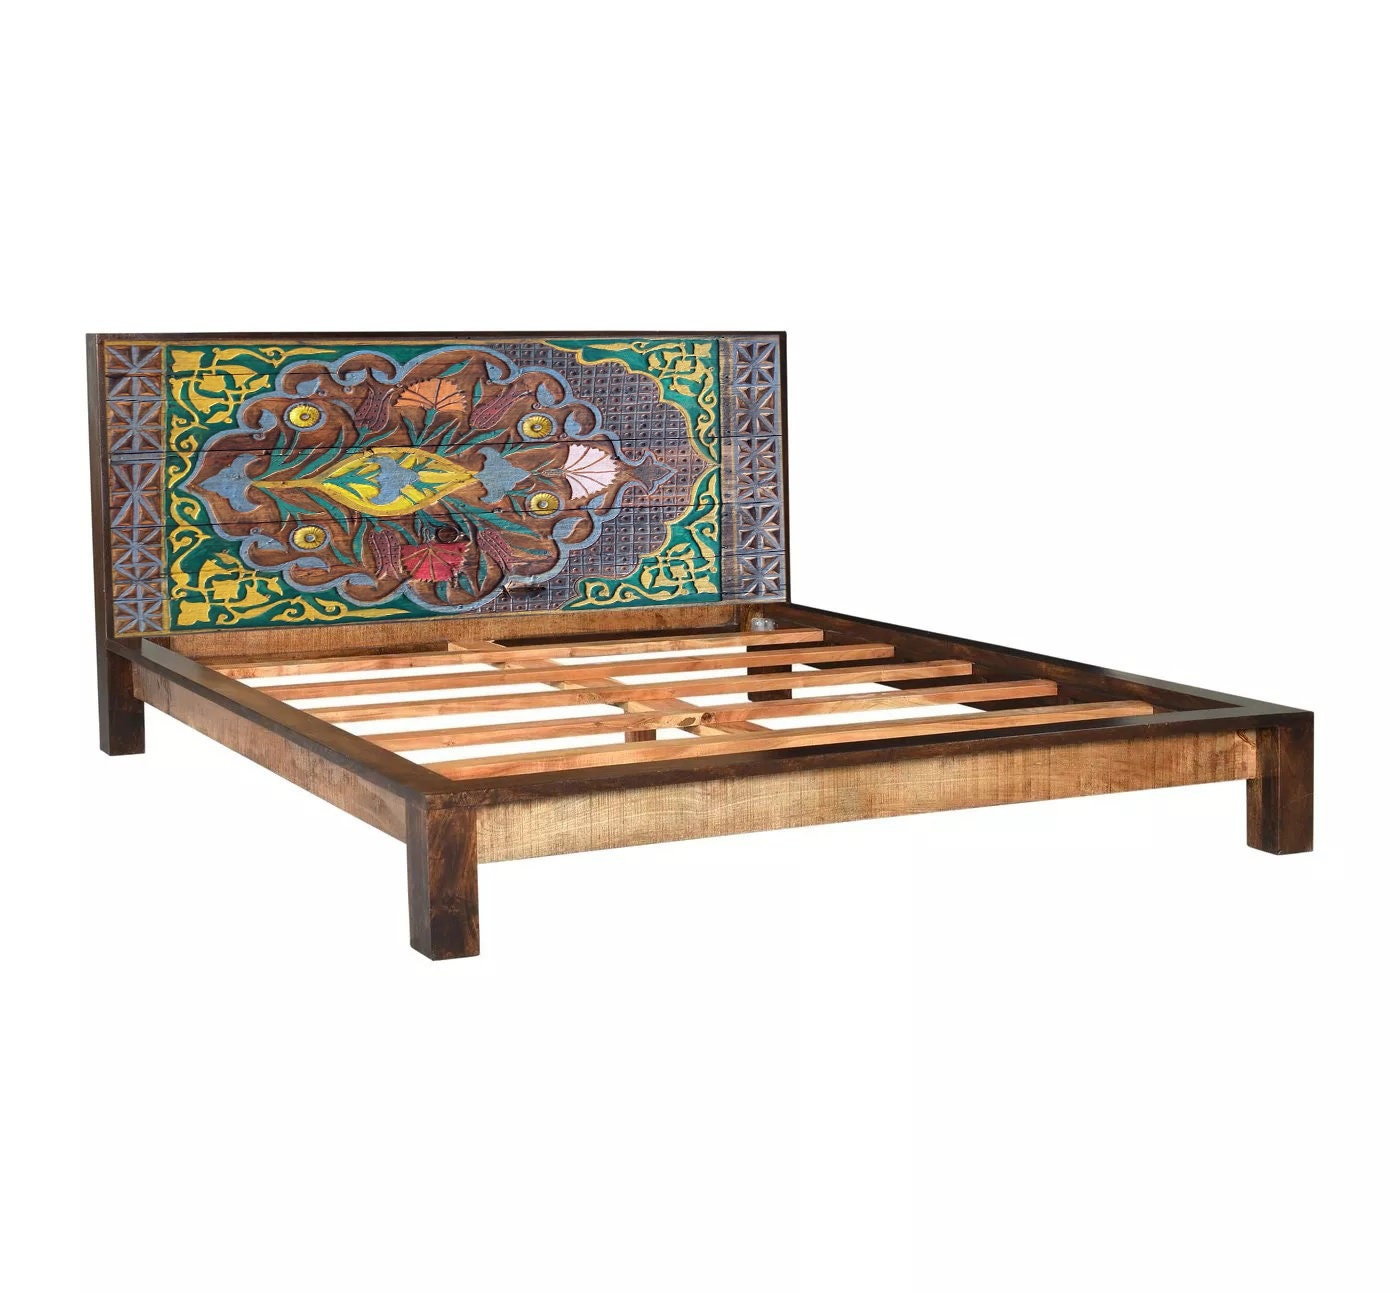 Solid Wood Bed Frame, Carved Boho King or Queen Headboard Footboard, Custom  size Wooden Bed, Rustic Bed Platform, Oriental Antique Furniture